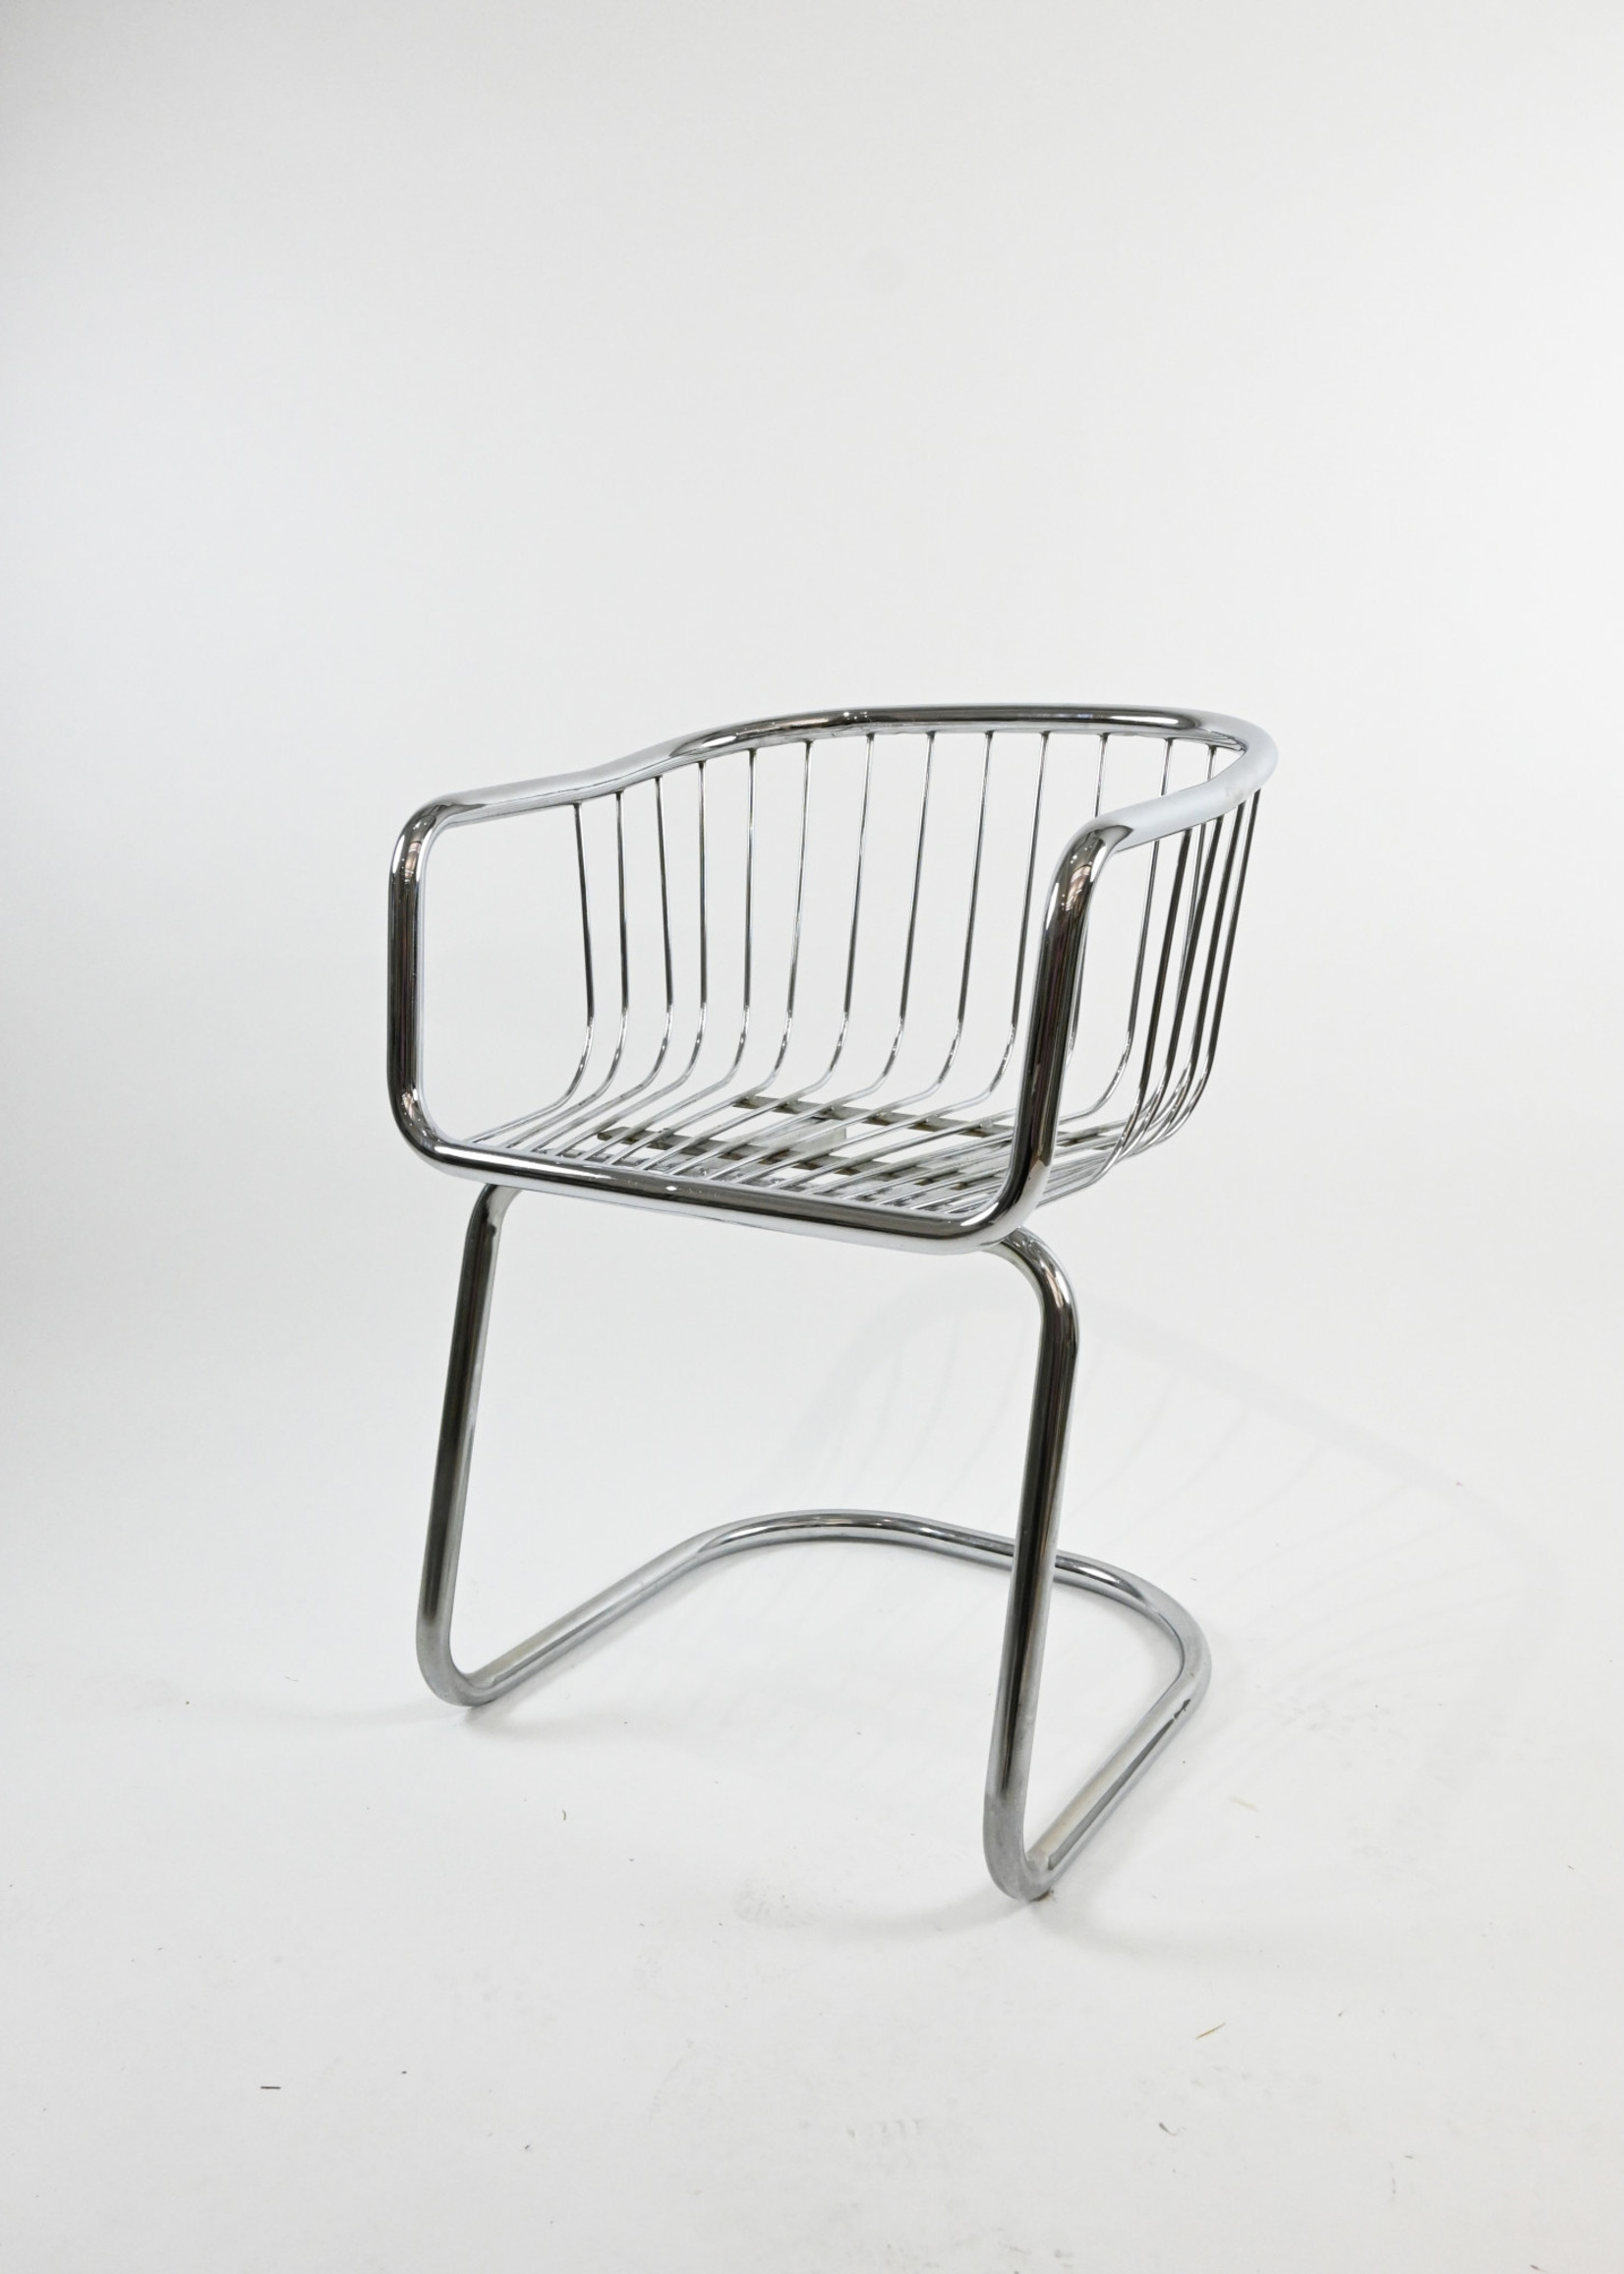 Vintage Gastone Rinaldi chair